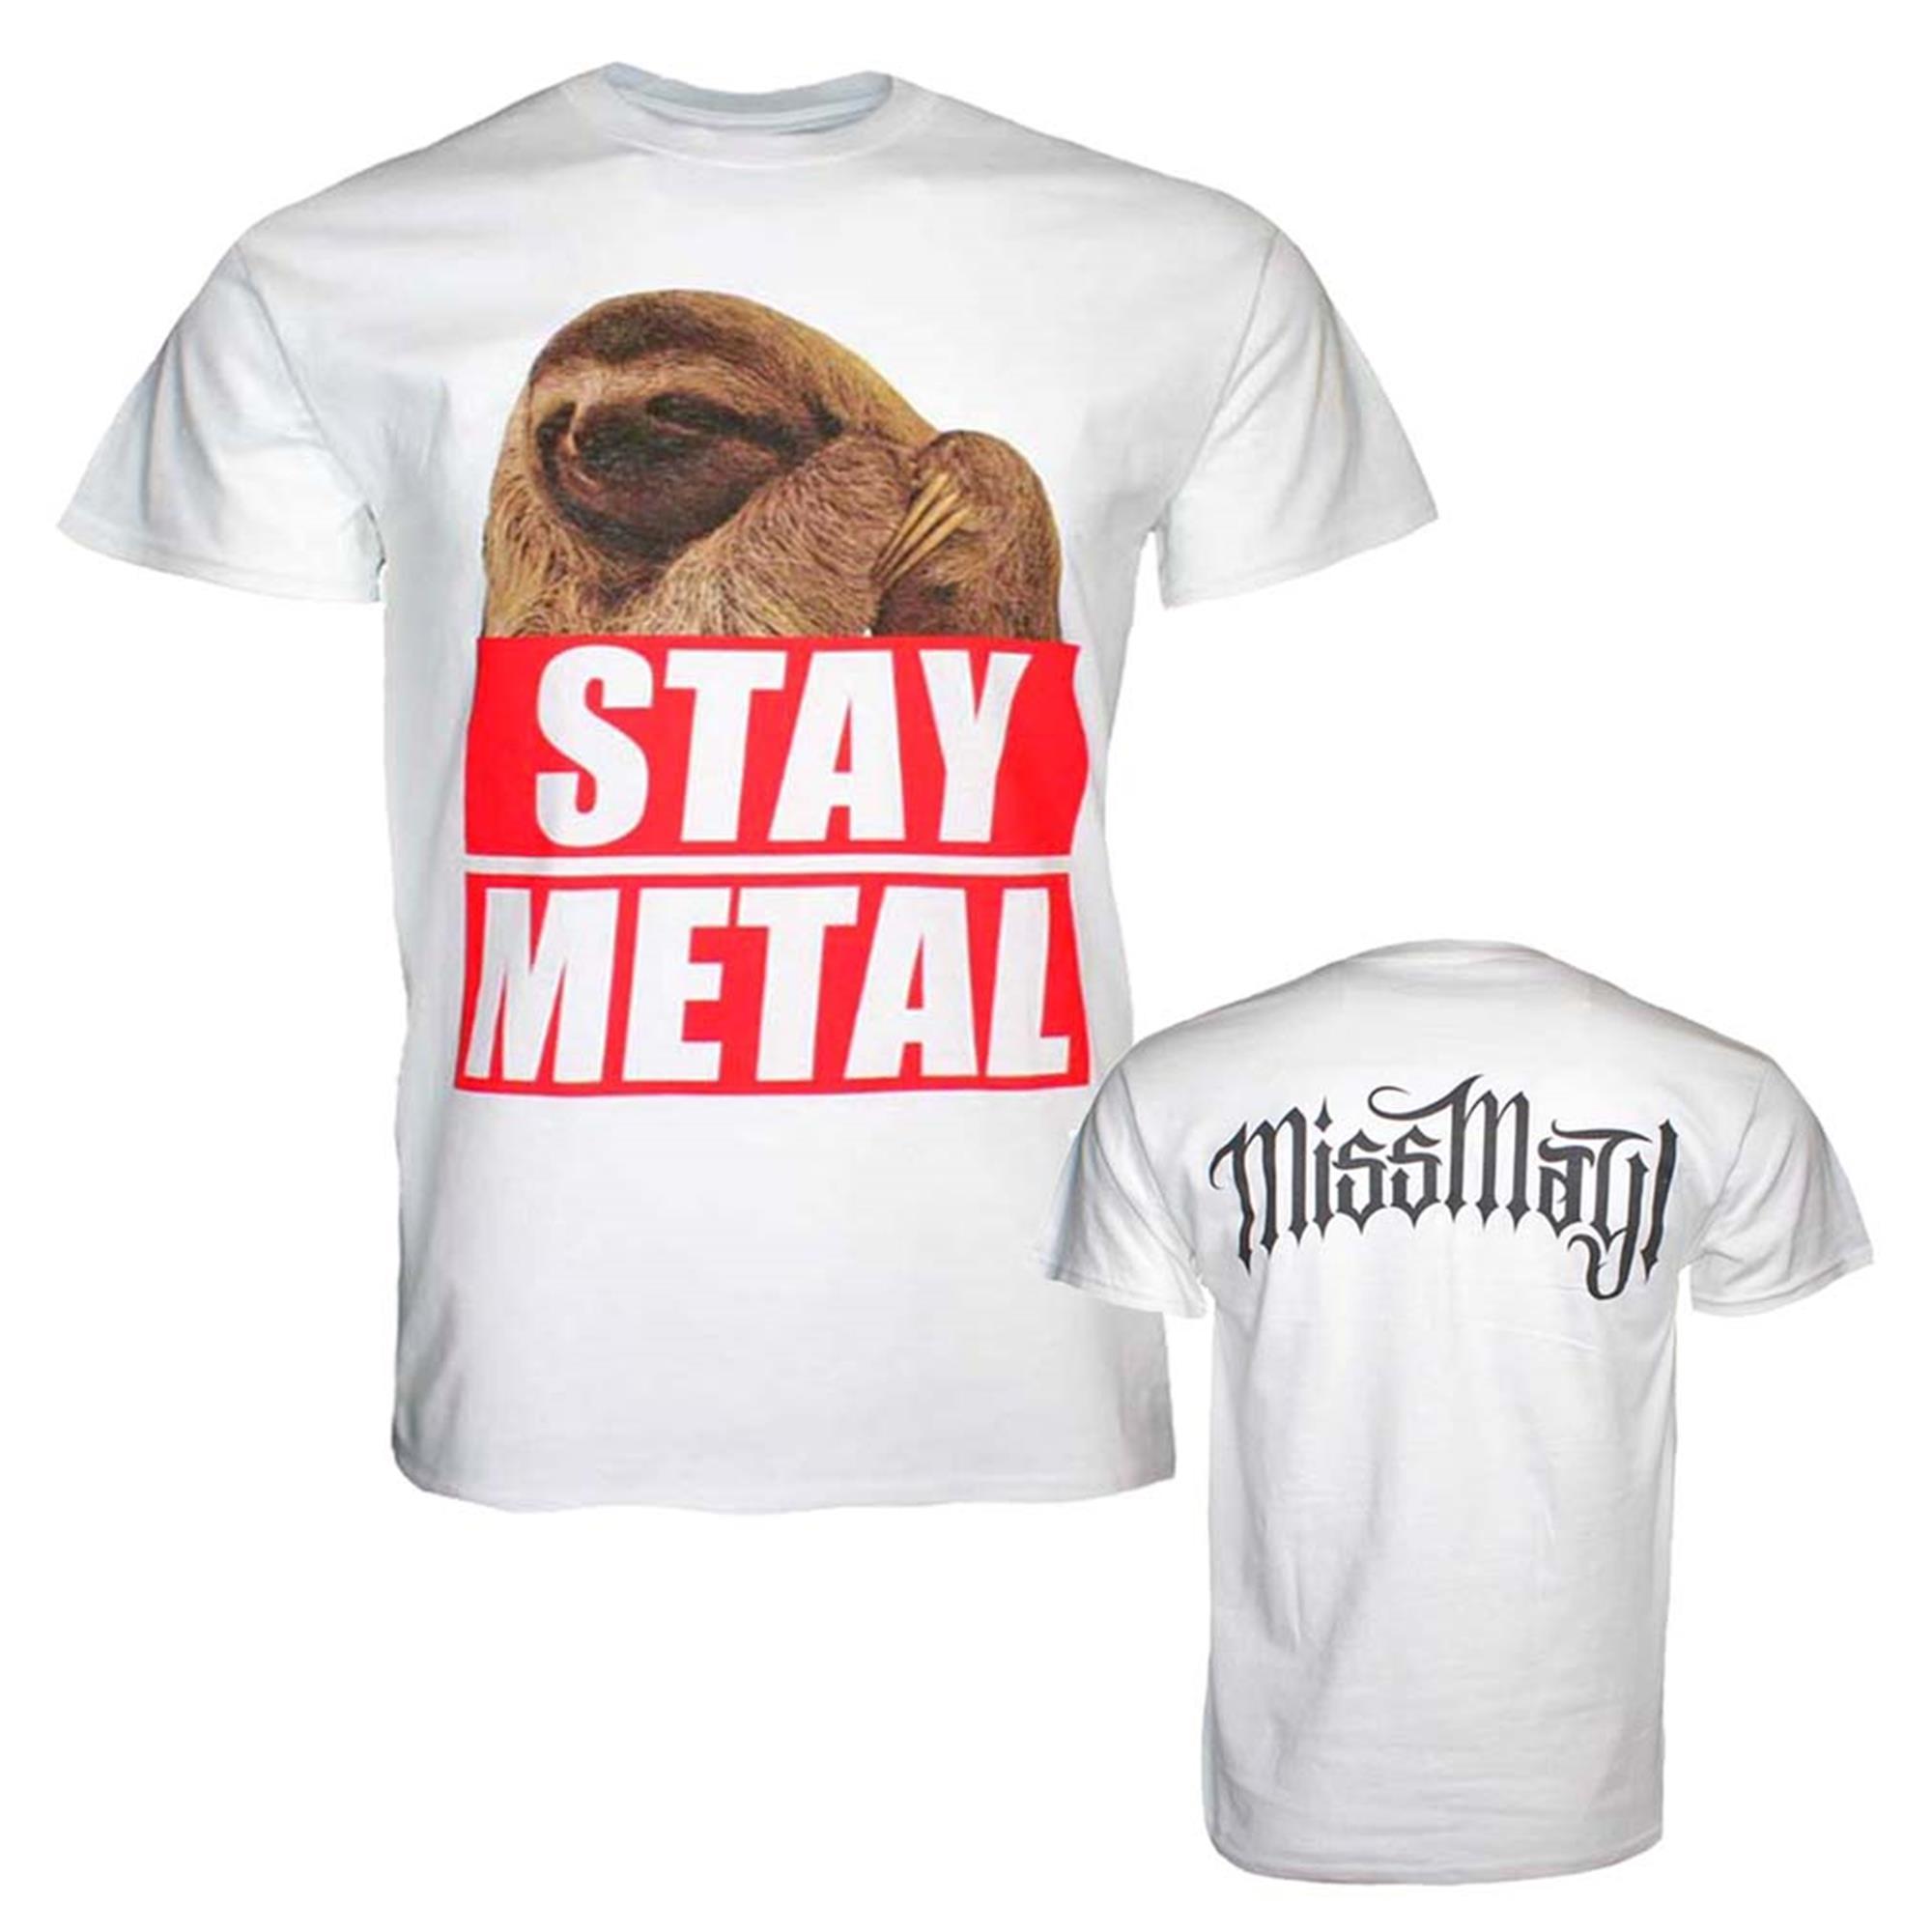 Miss May I Stay Metal Sloth T-Shirt